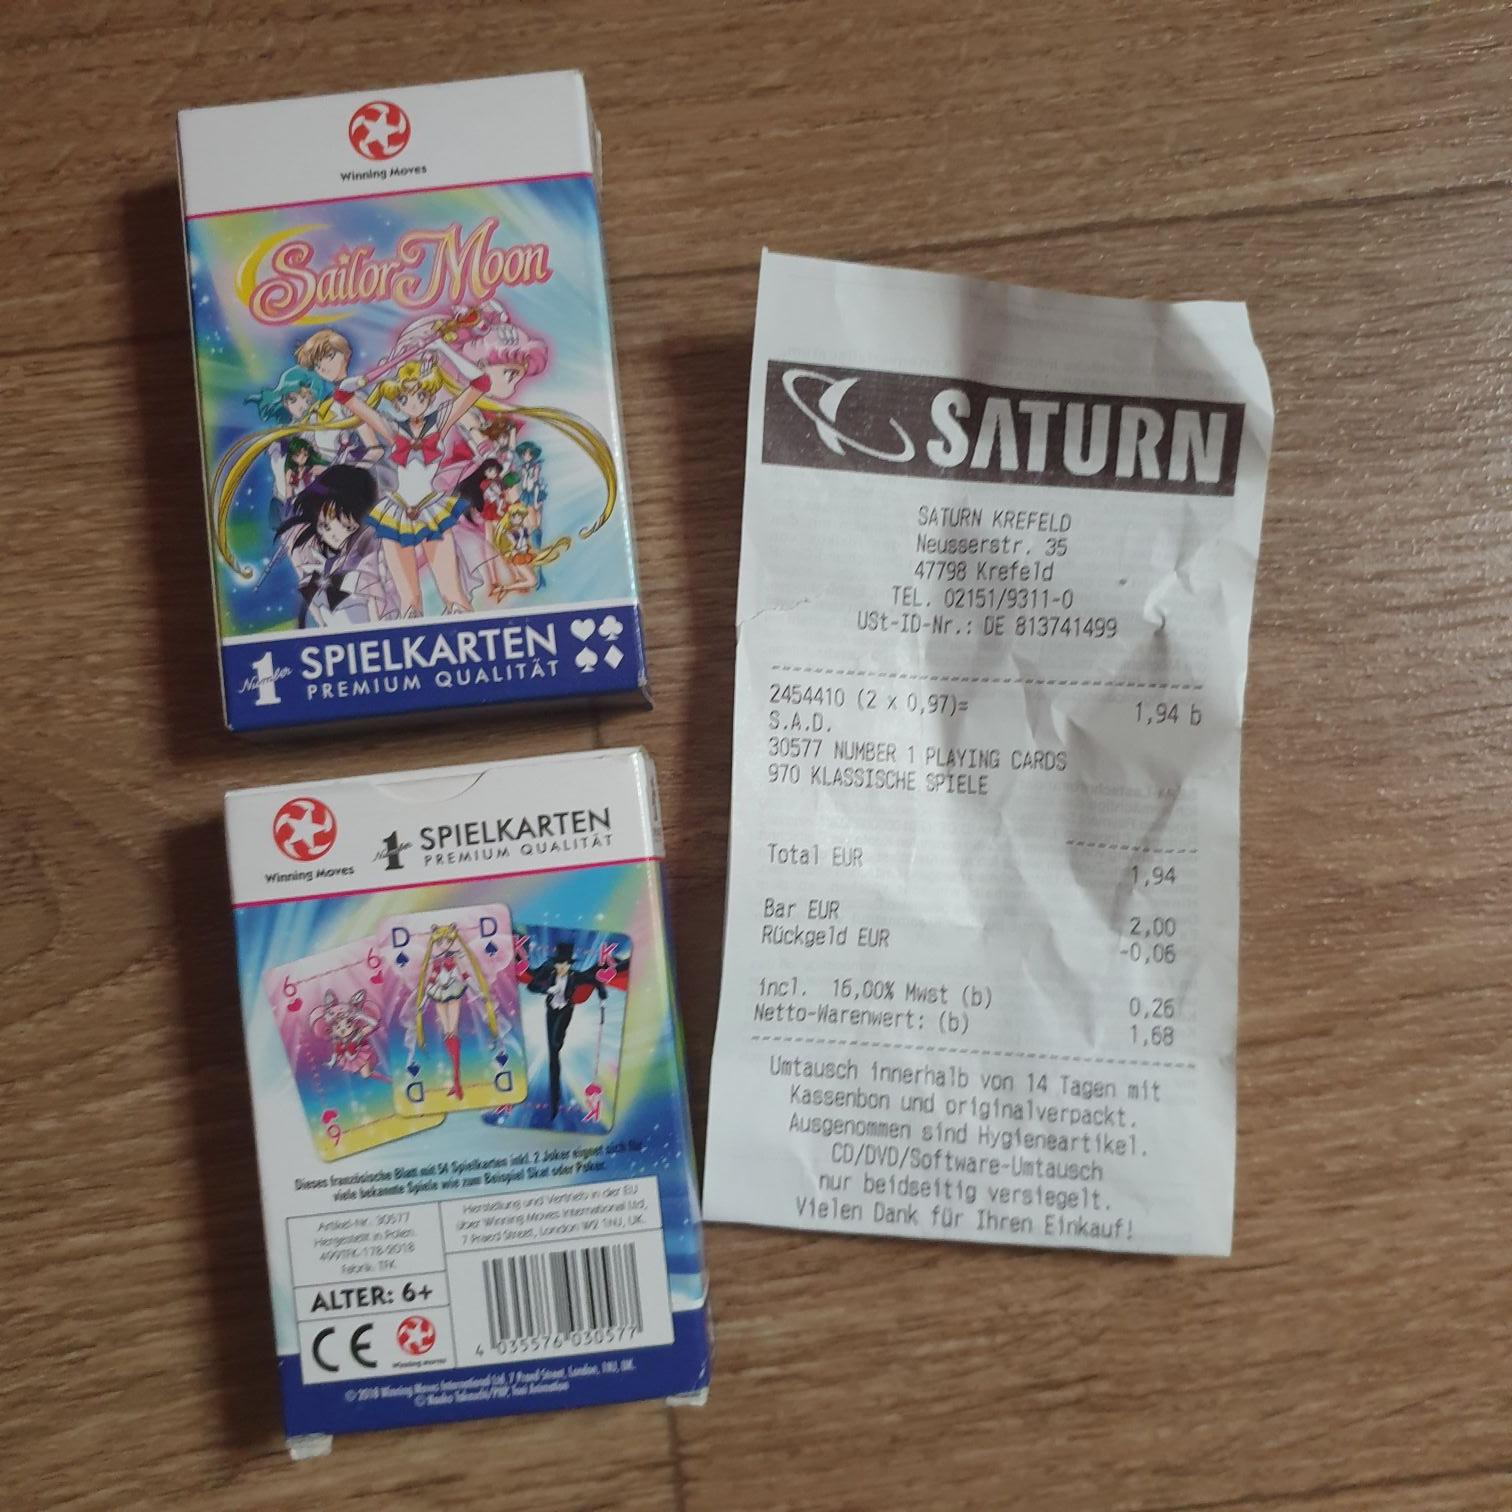 Saturn Krefeld - Sailor Moon Spielkarten